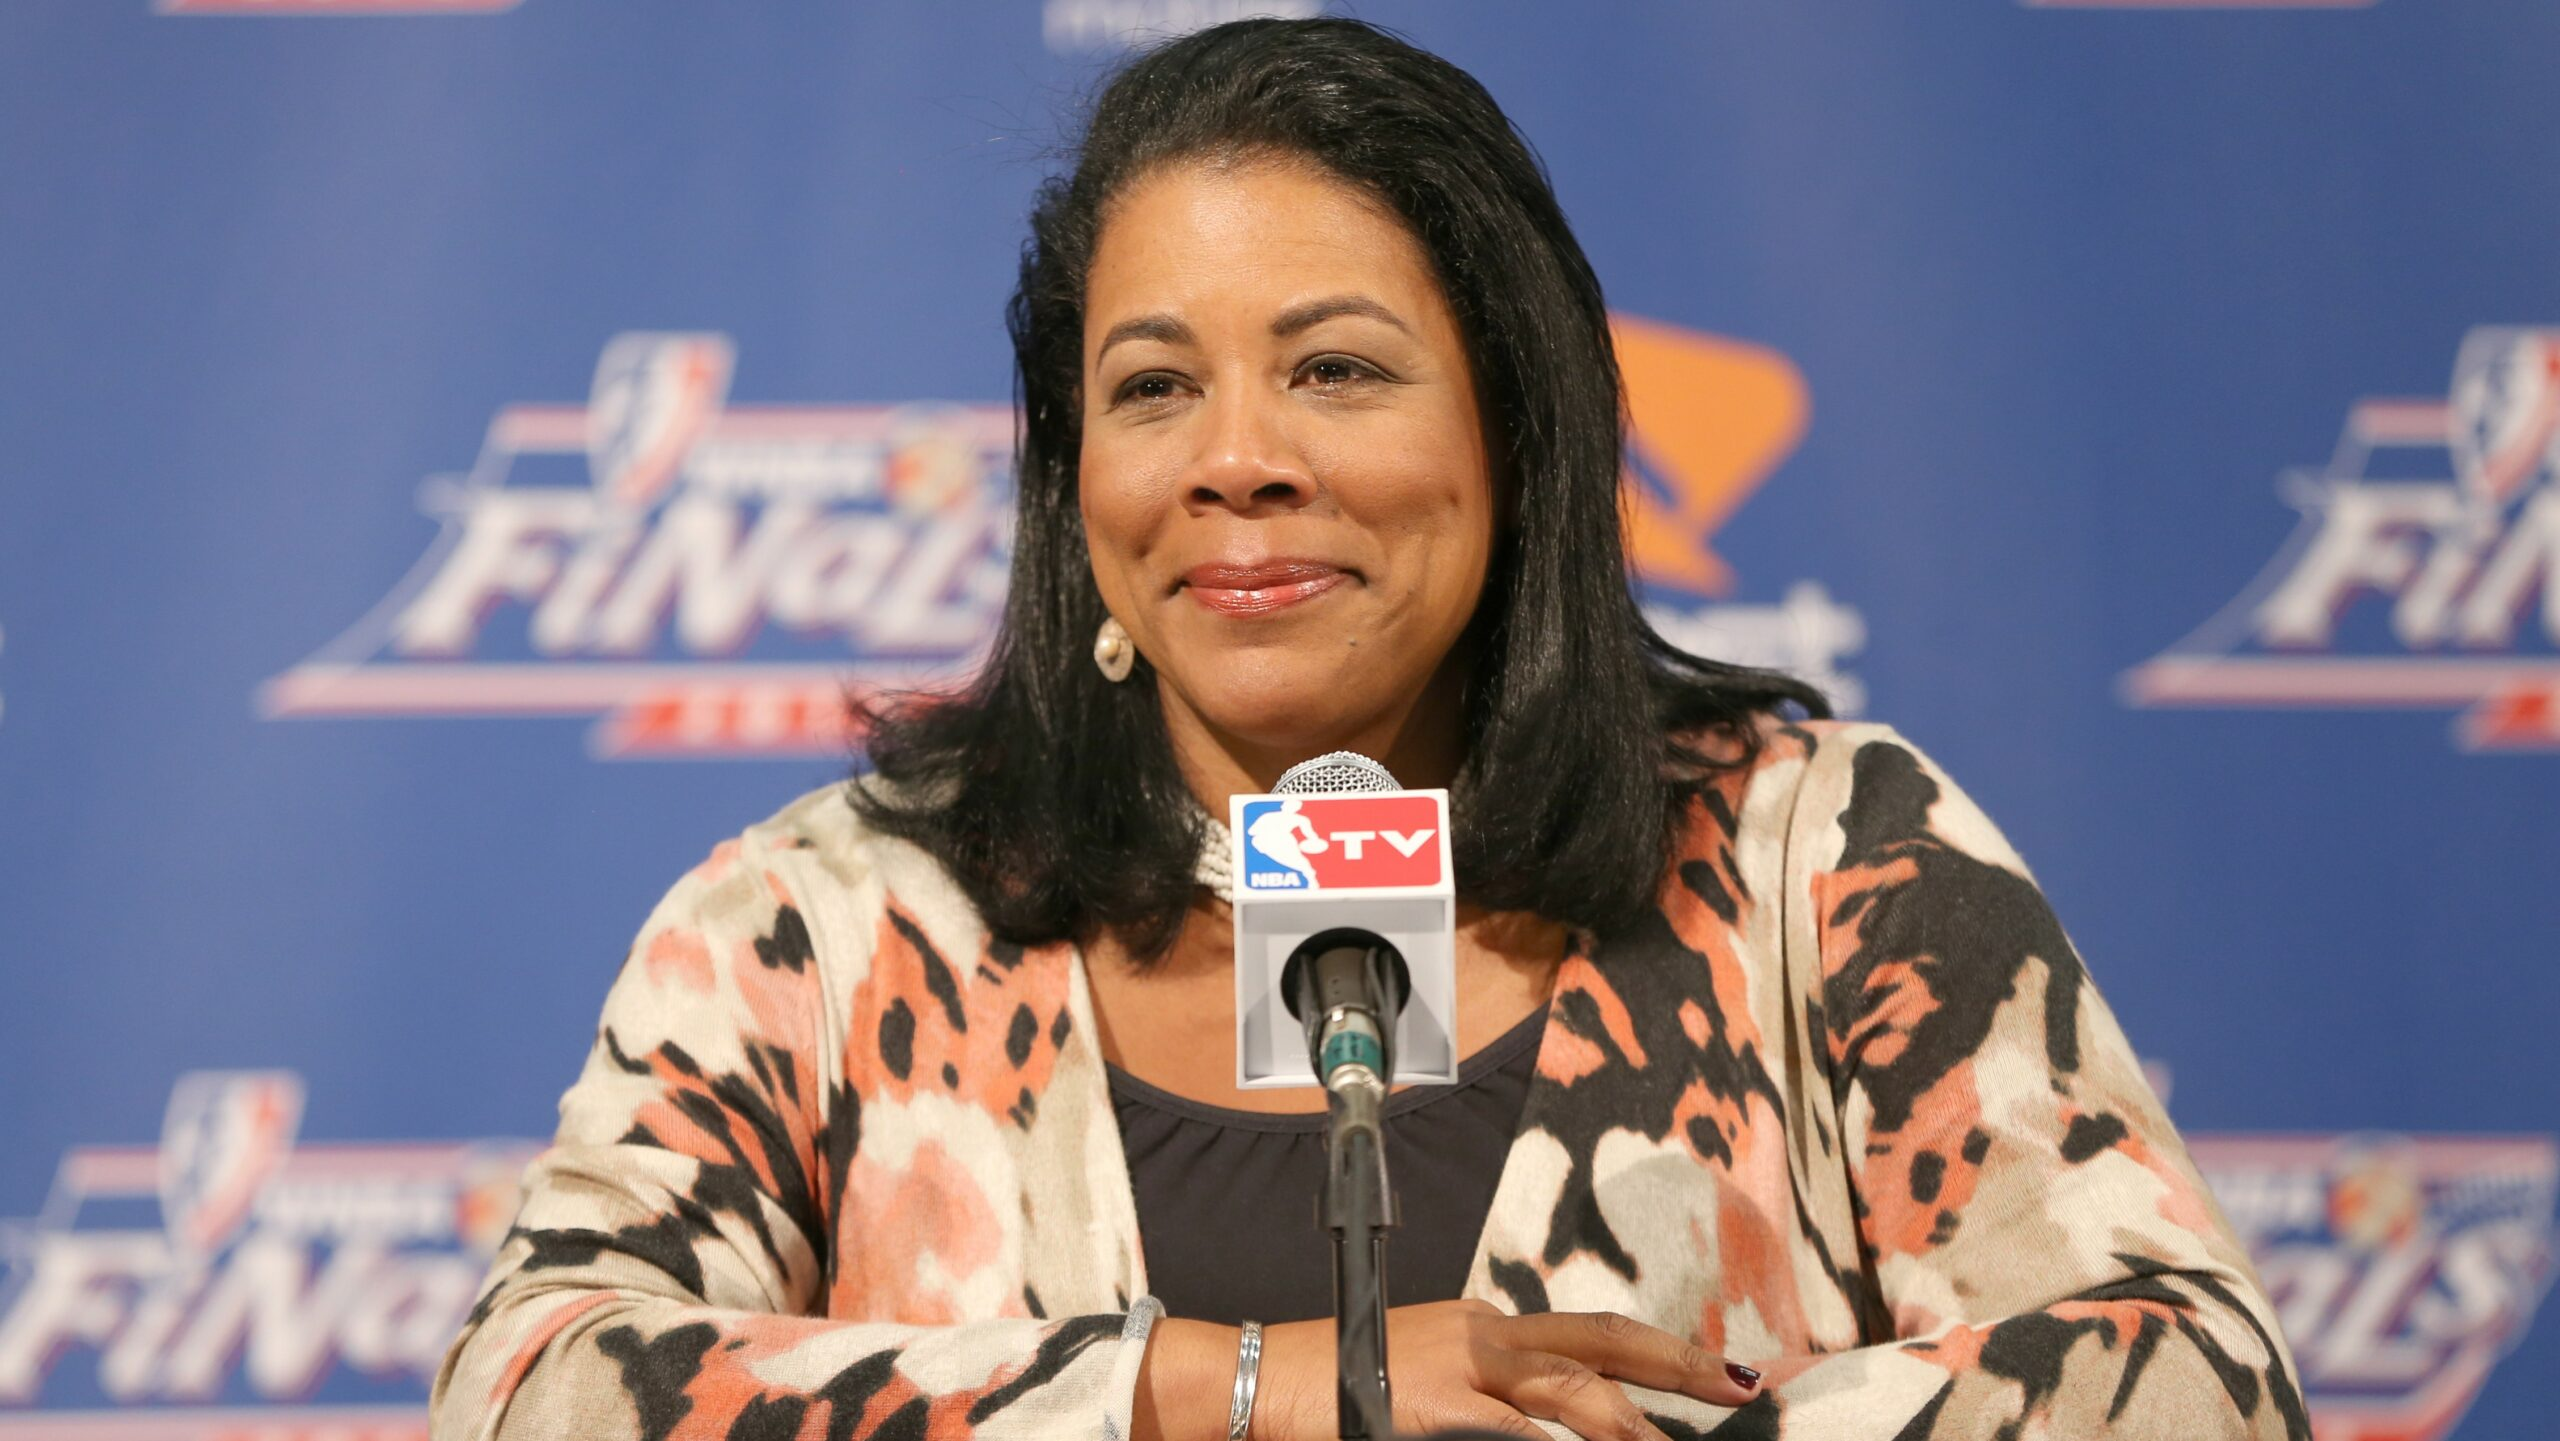 Dishin & Swishin 10/18/12 Podcast: WNBA President Laurel Richie on stability, growth and more